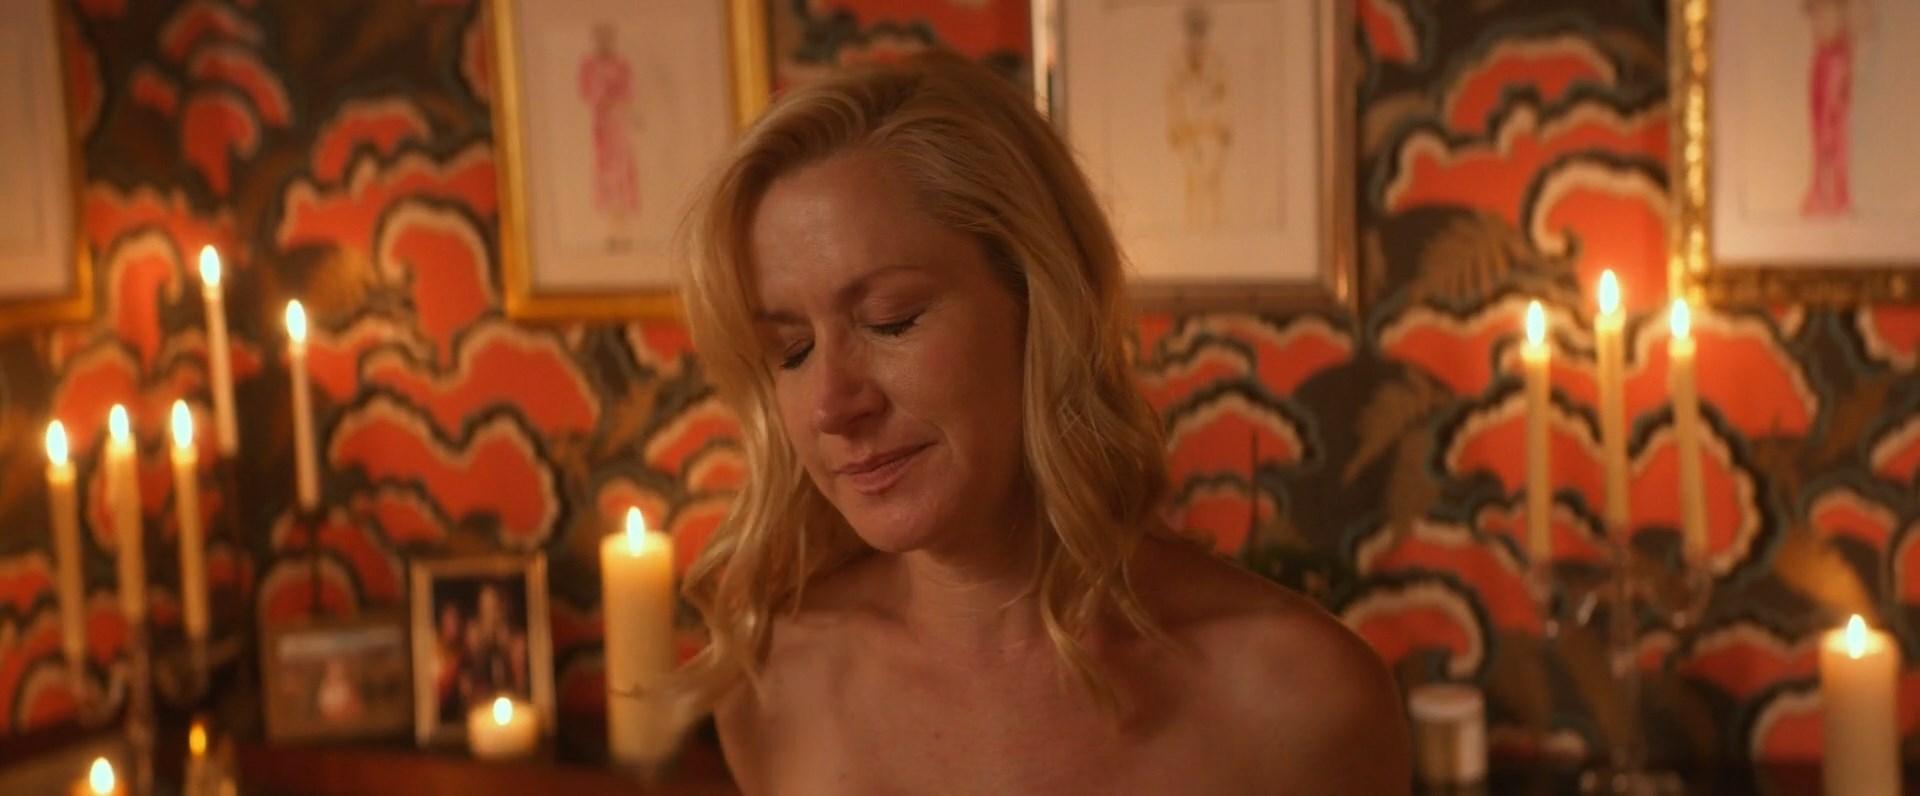 Desi big boobs nude